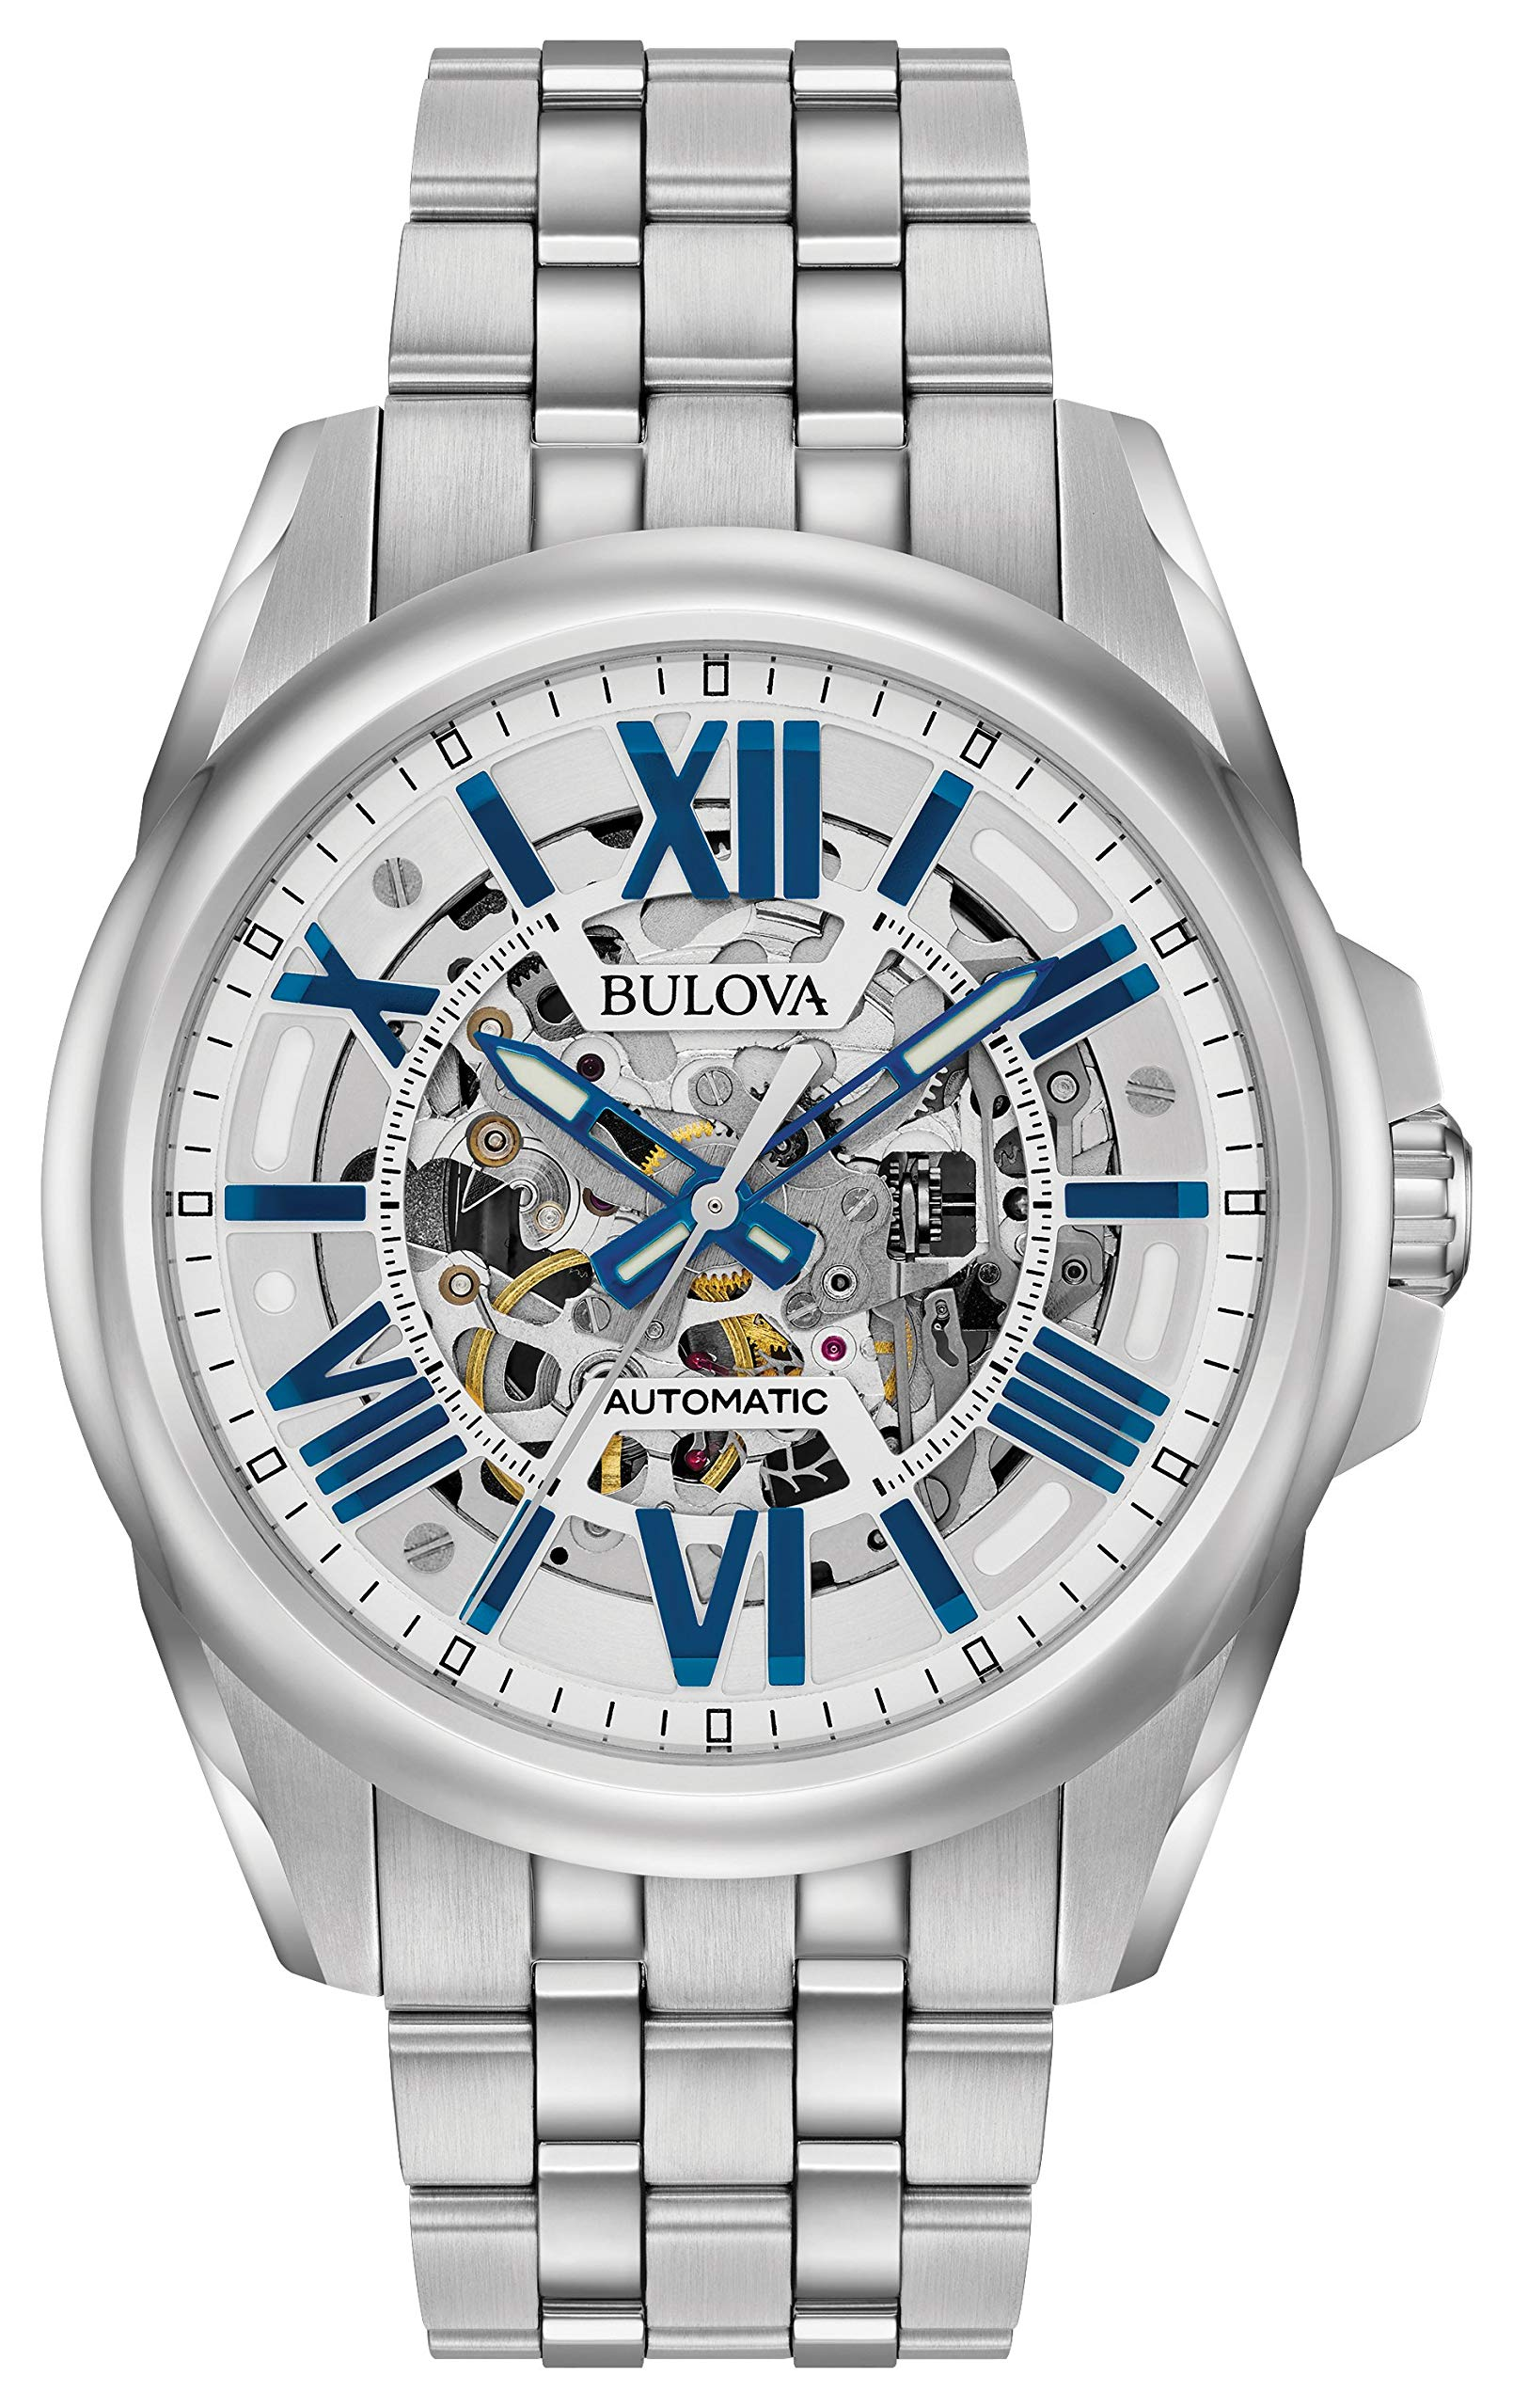 Bulova Mechanical Hand Wind Watch Stainless Steel Silver